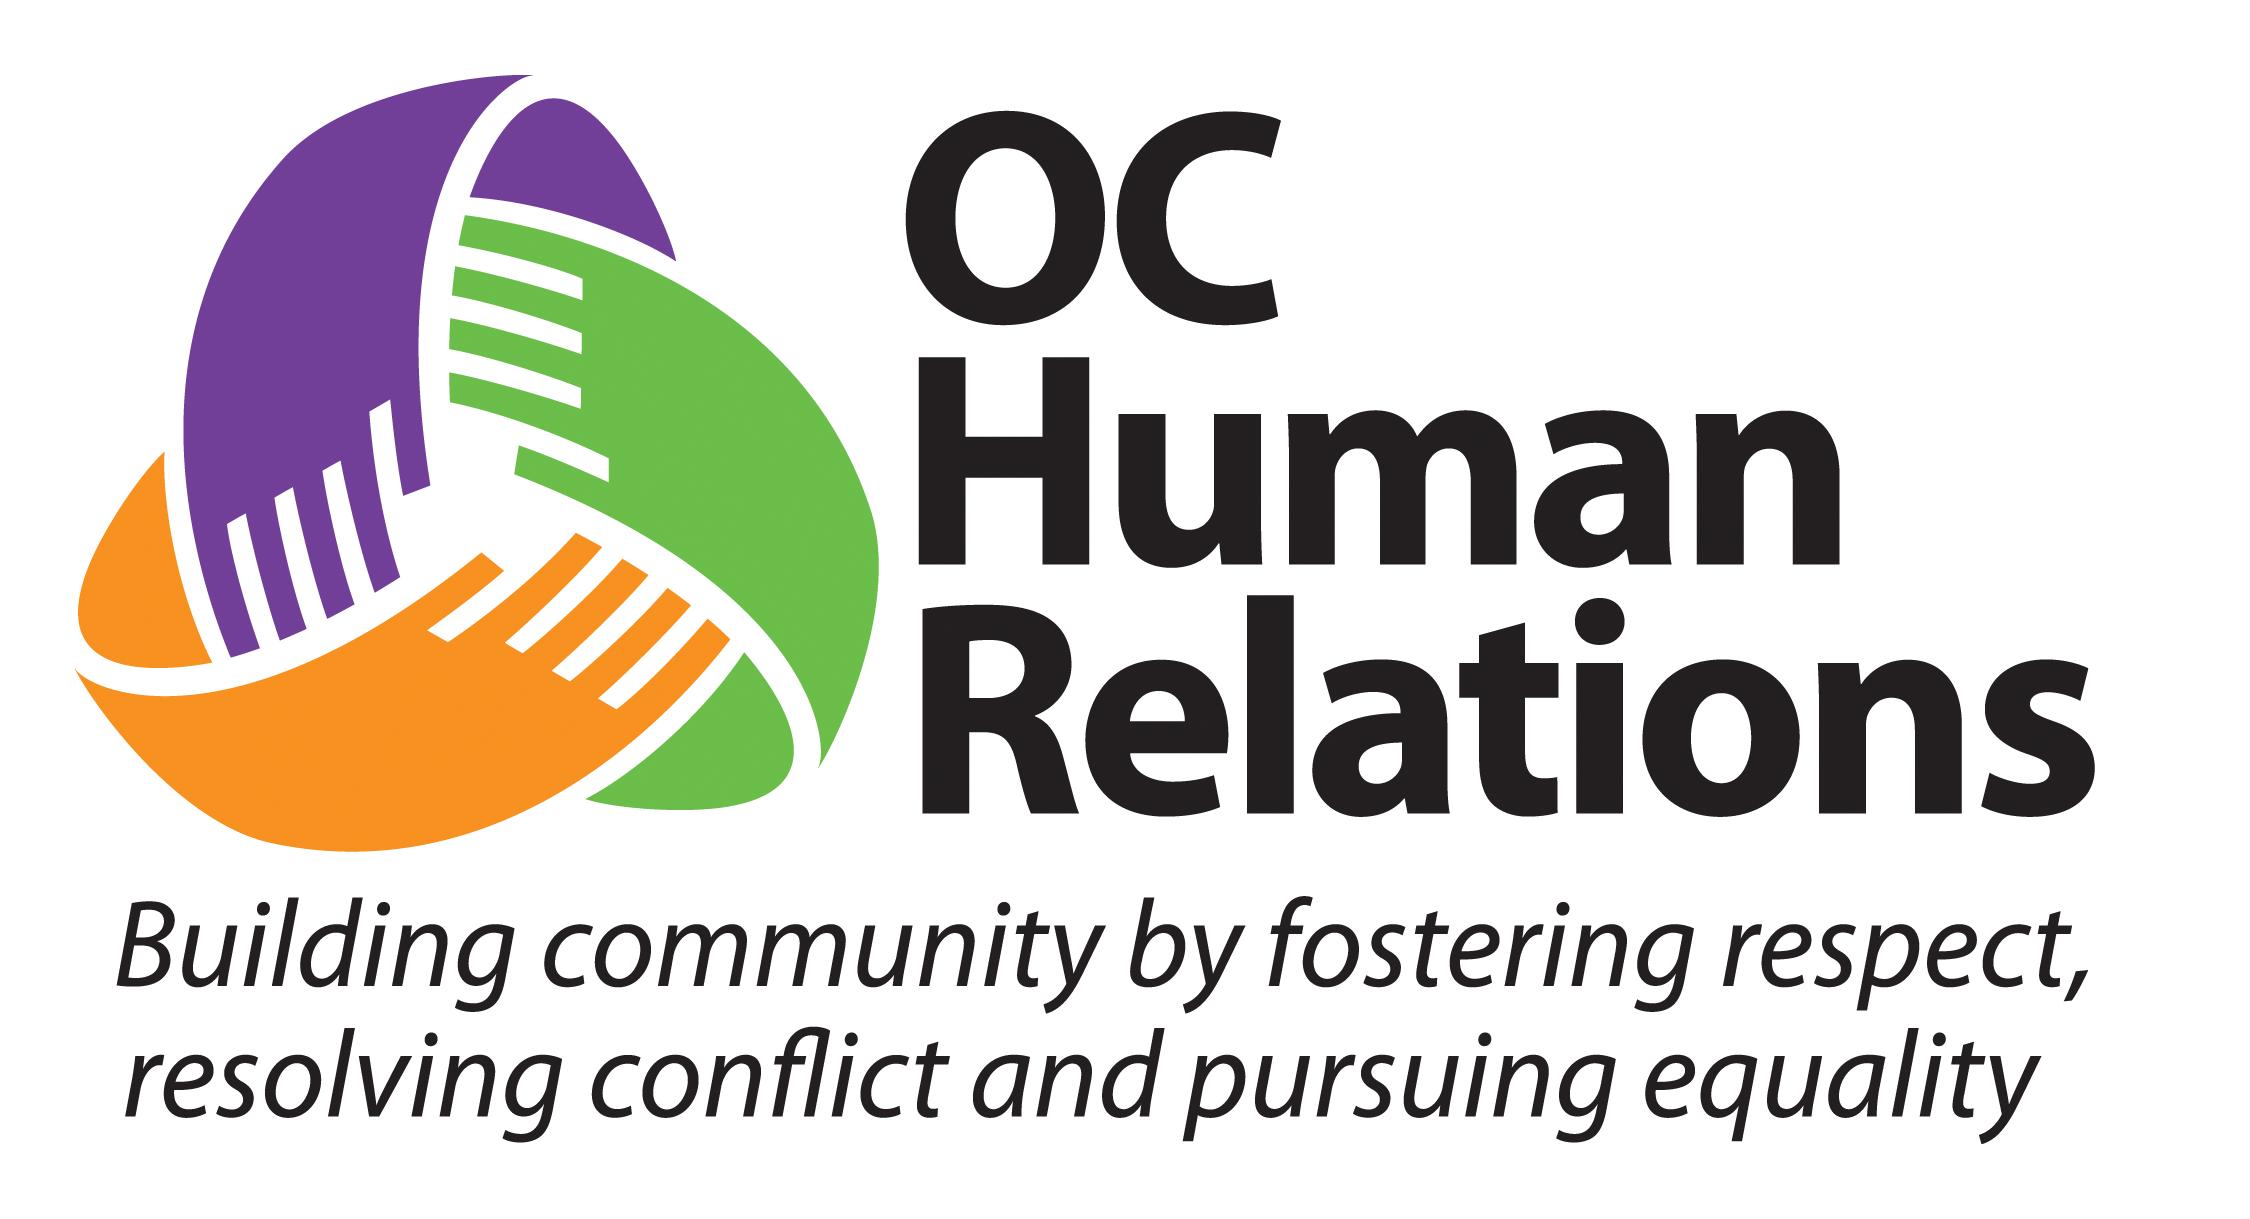 Logos oc relations download. Human clipart human relation